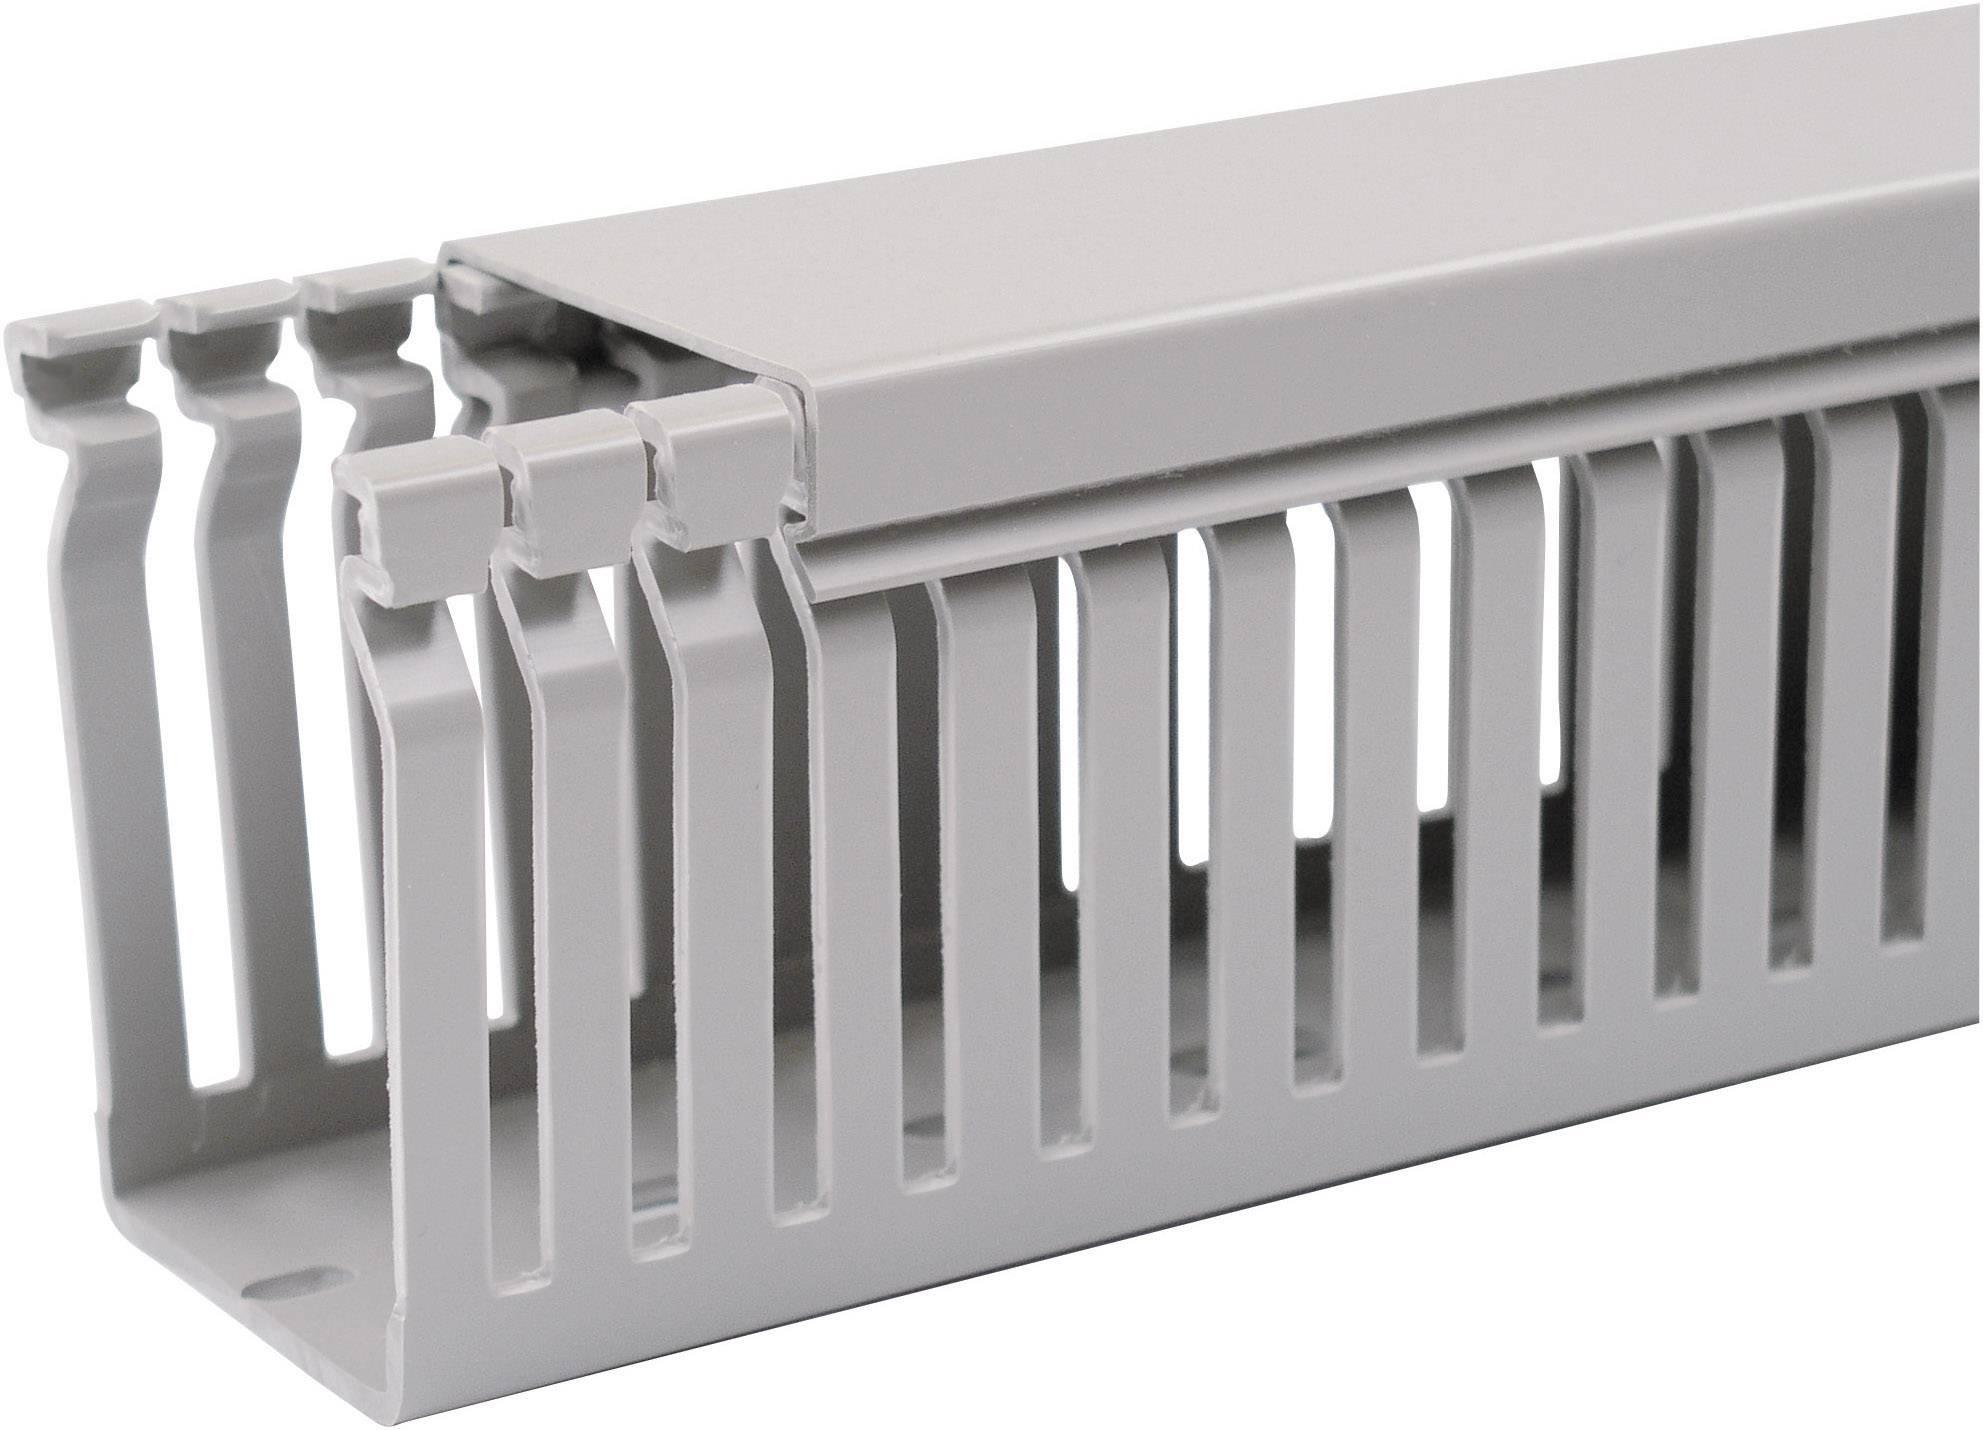 Elektroinstalační lišta OBO Bettermann, 6178012, 40x40 mm, 2 m, šedá